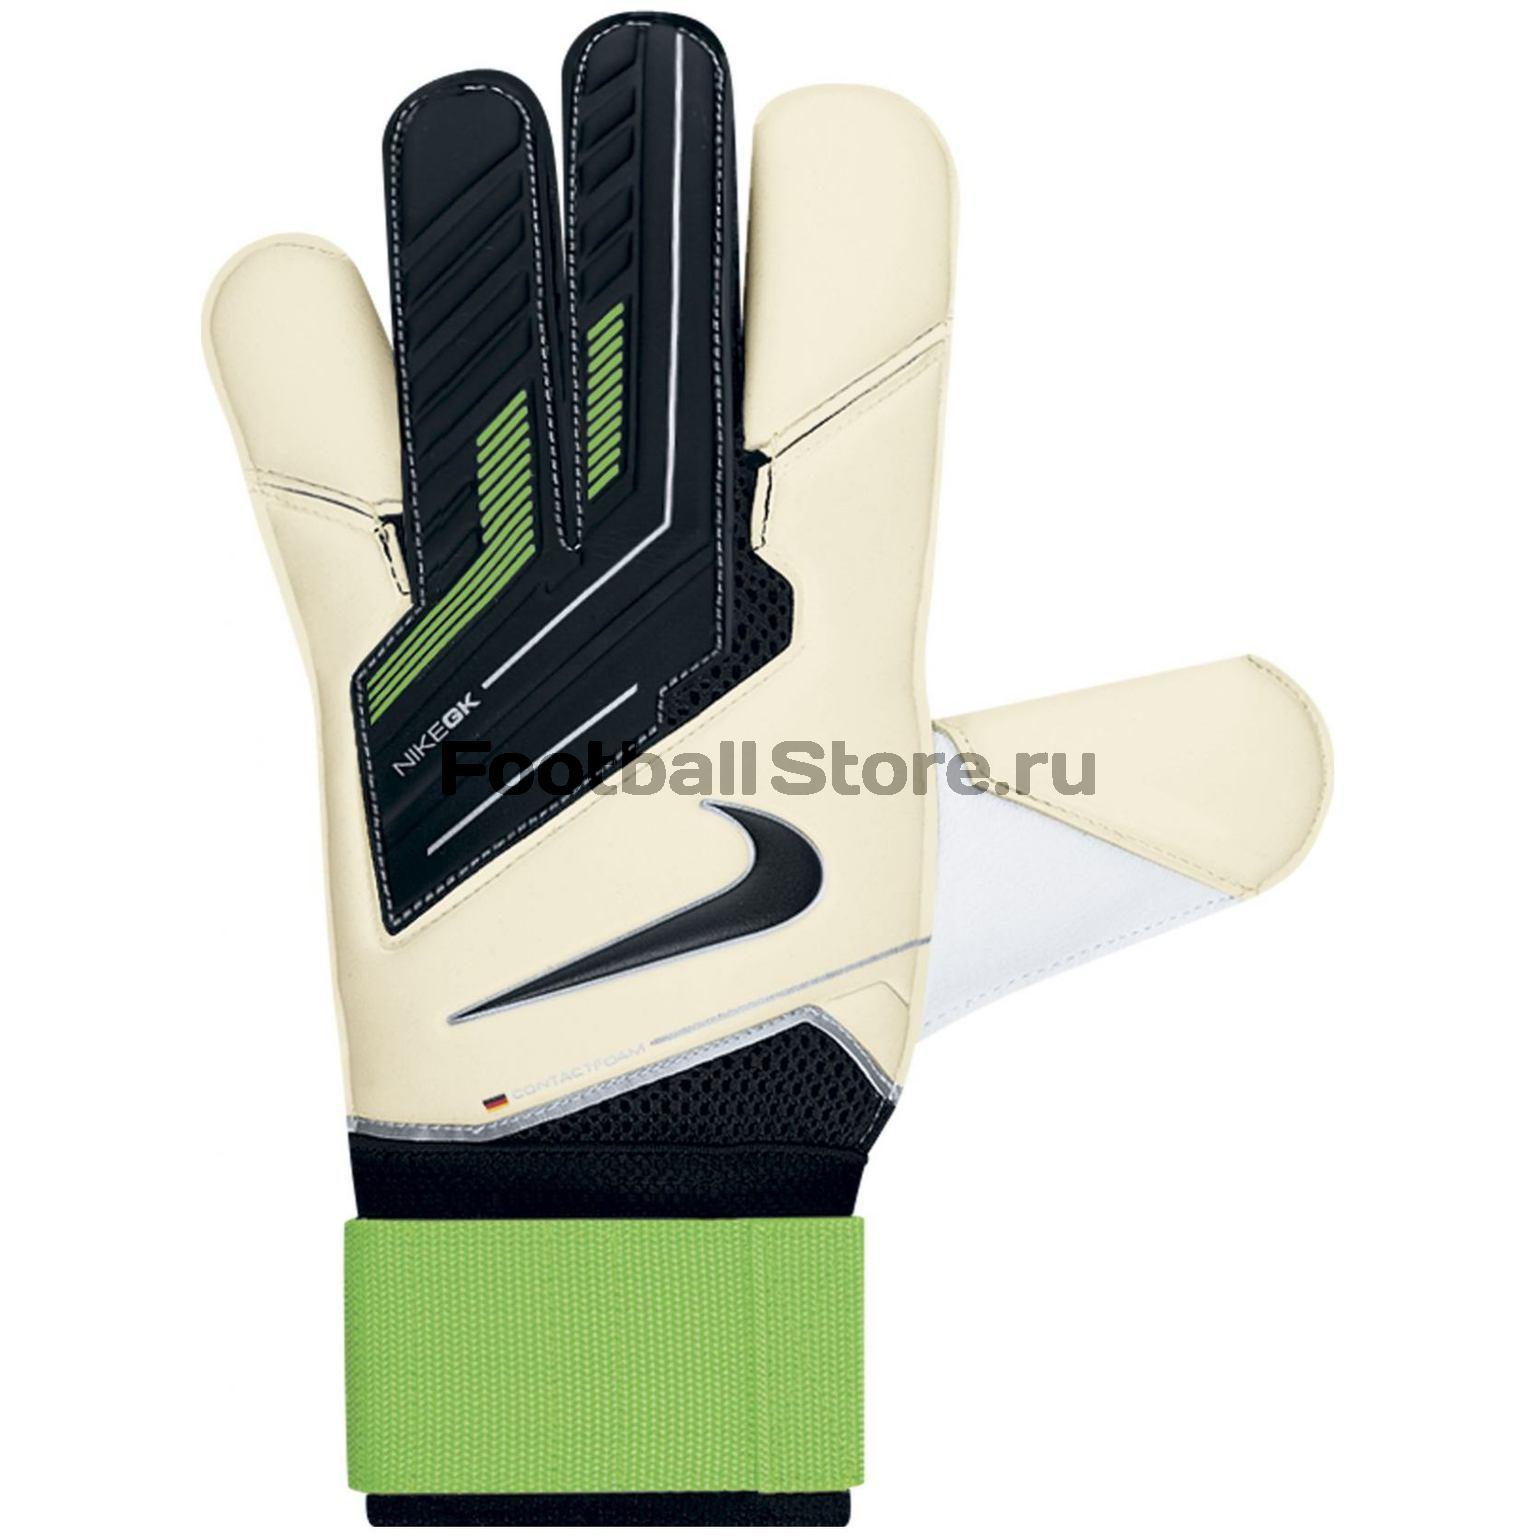 Перчатки Nike Вратарские перчатки Nike gk vapor grip 3